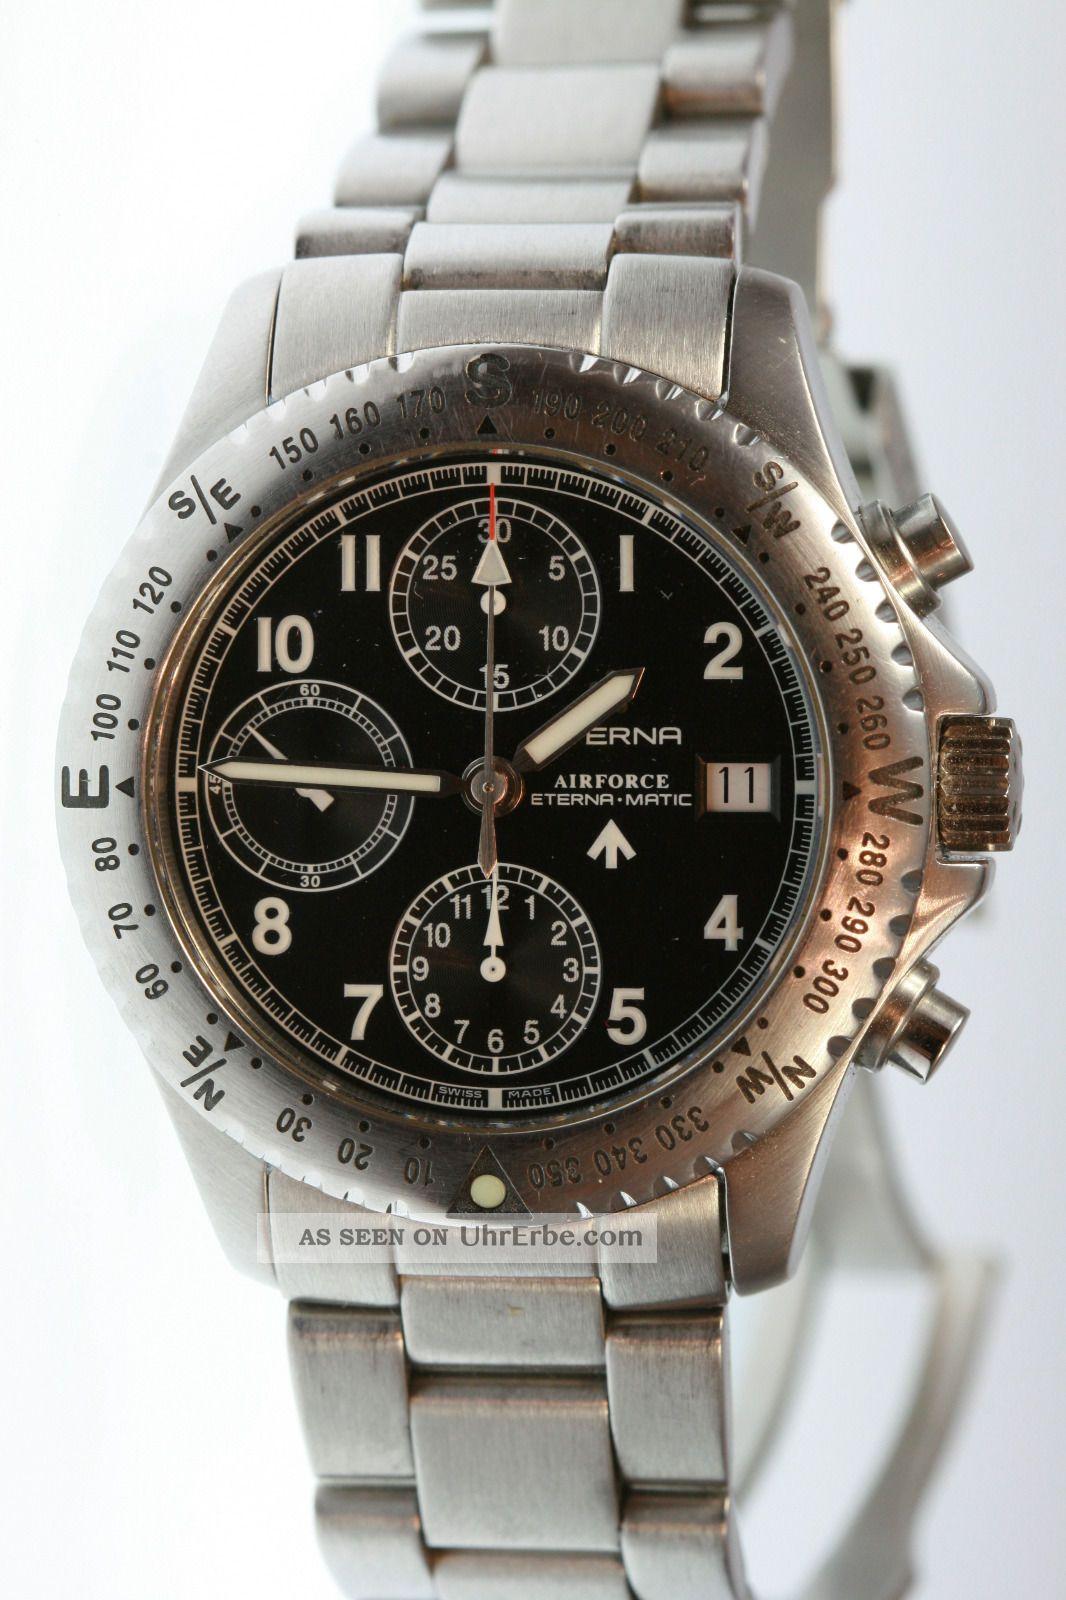 Eterna - Matic Airforce Chronograph Armbanduhren Bild